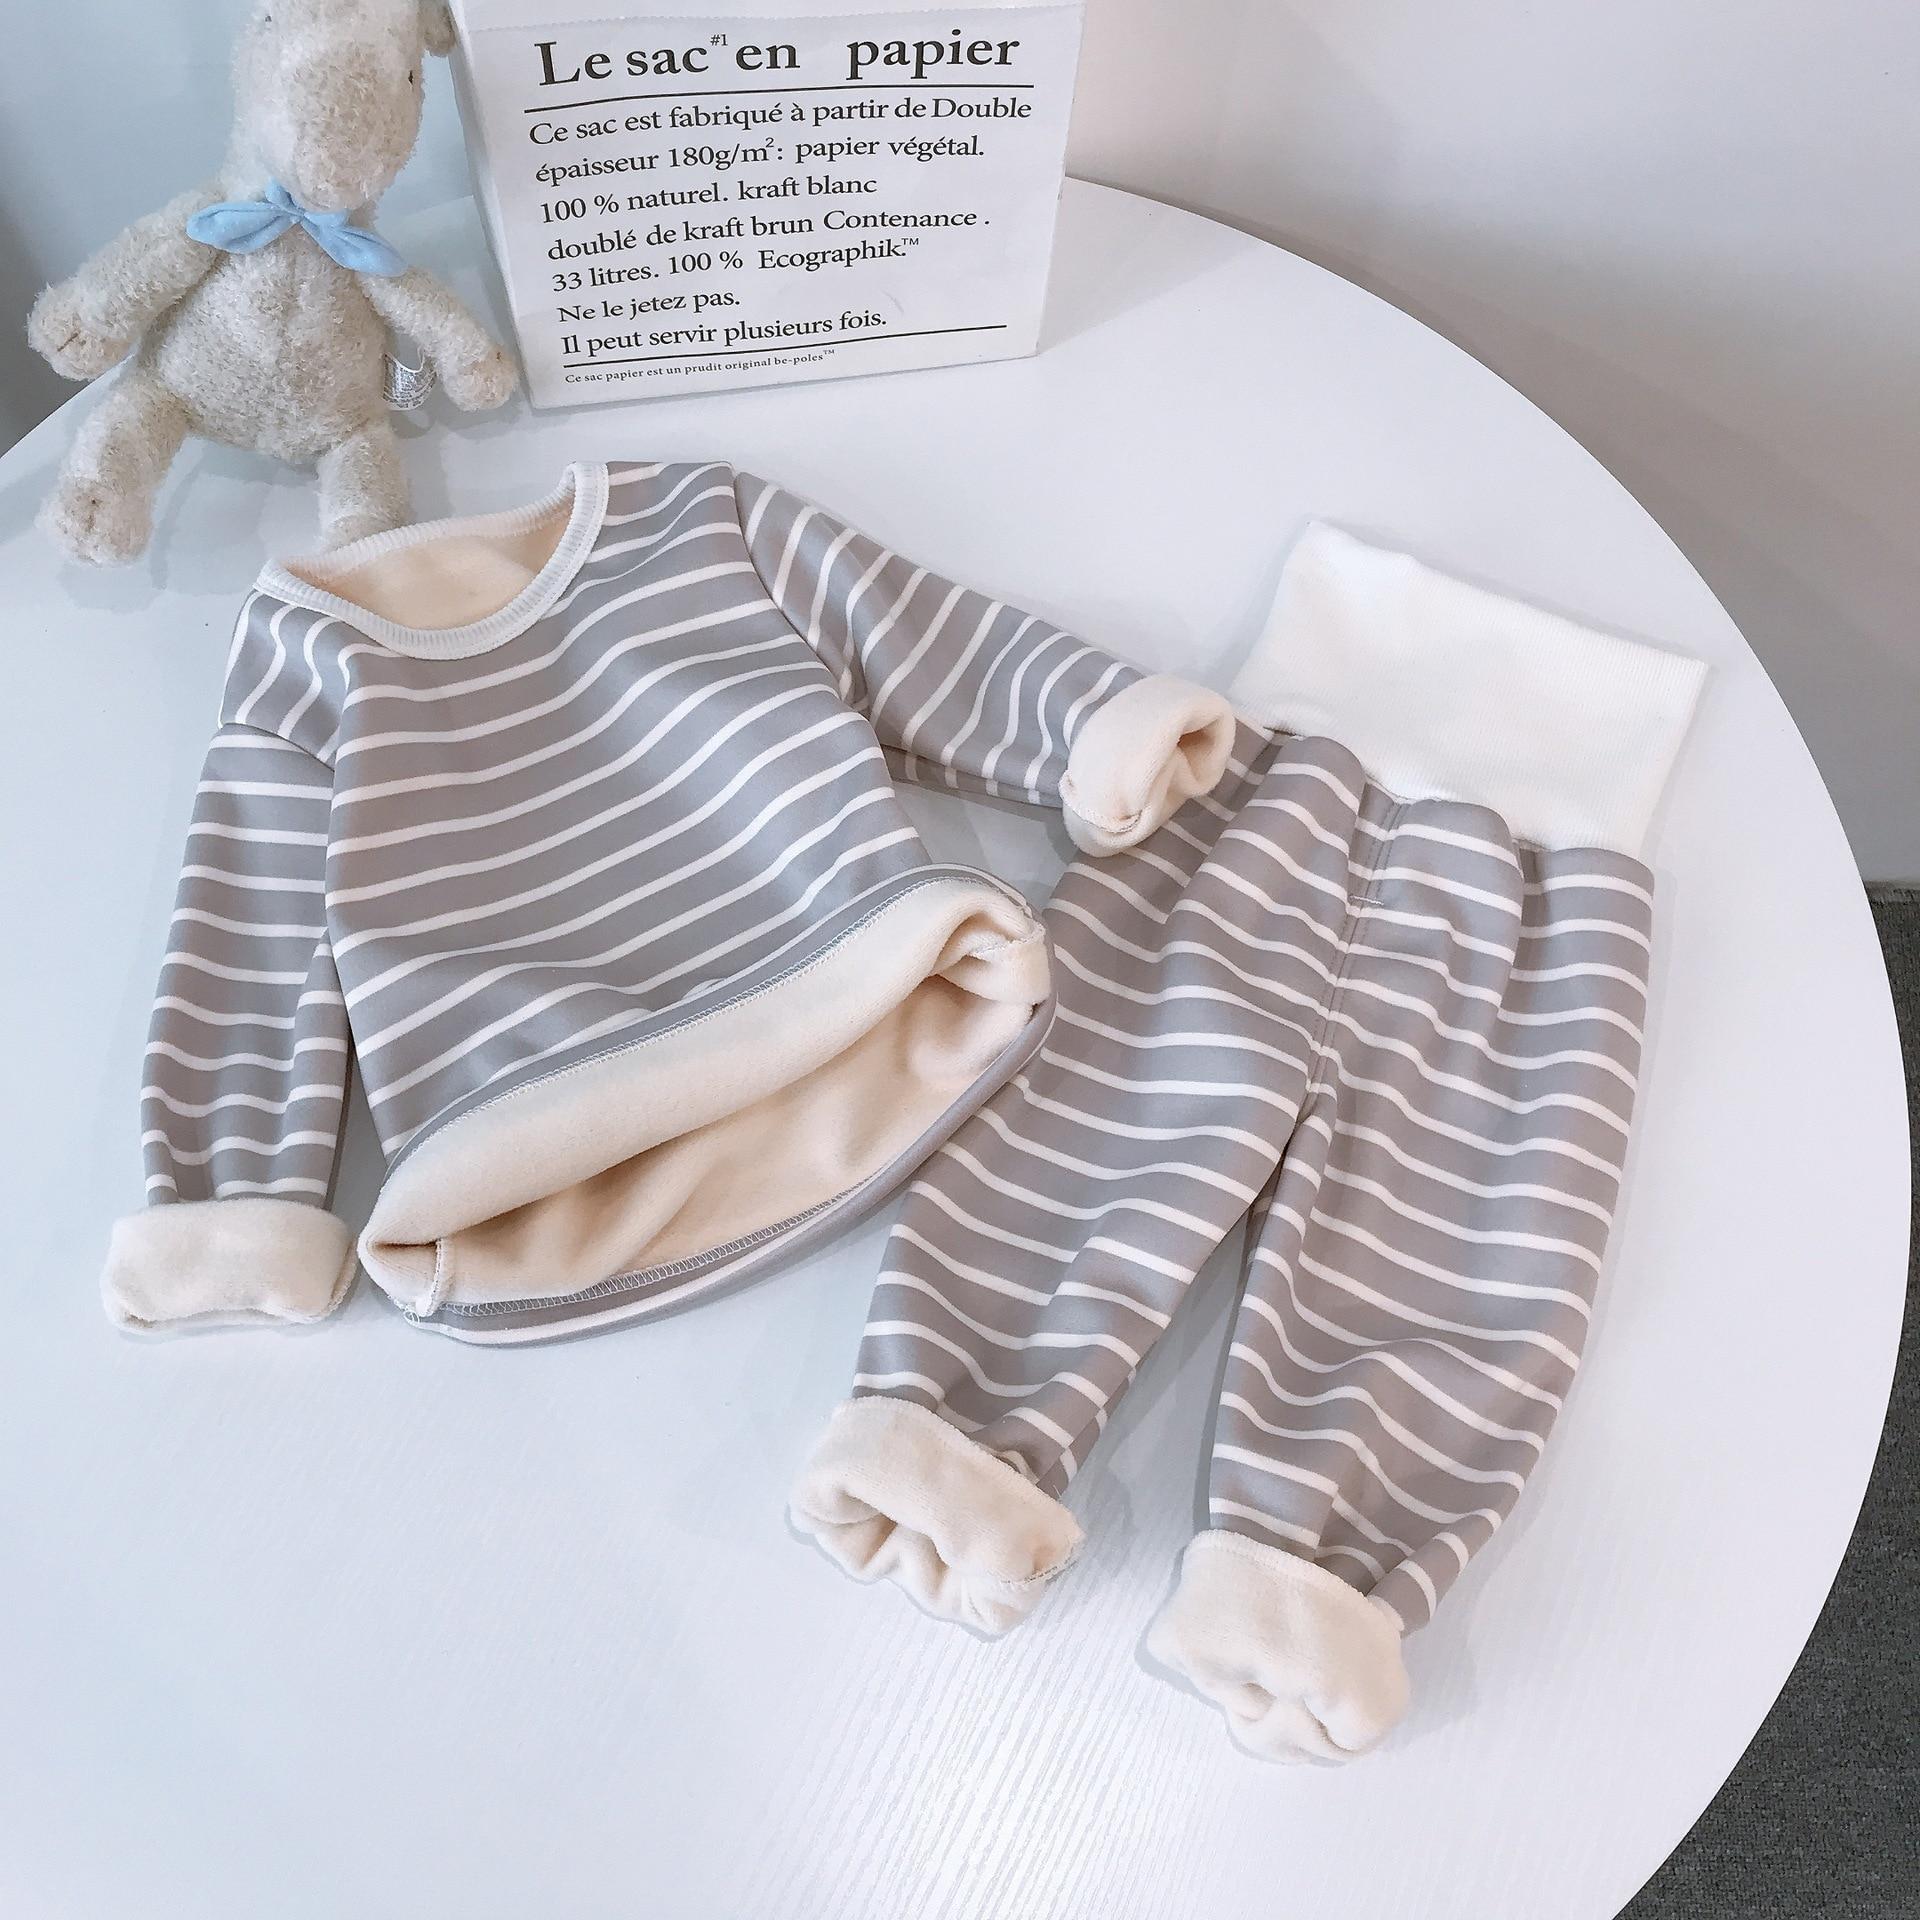 Children Pajamas Sets Baby Boys Girls Clothing Sweatshirt Waist Pants Set Toddler Warm Autumn Winter Outfits Kids Suit Clothes 4